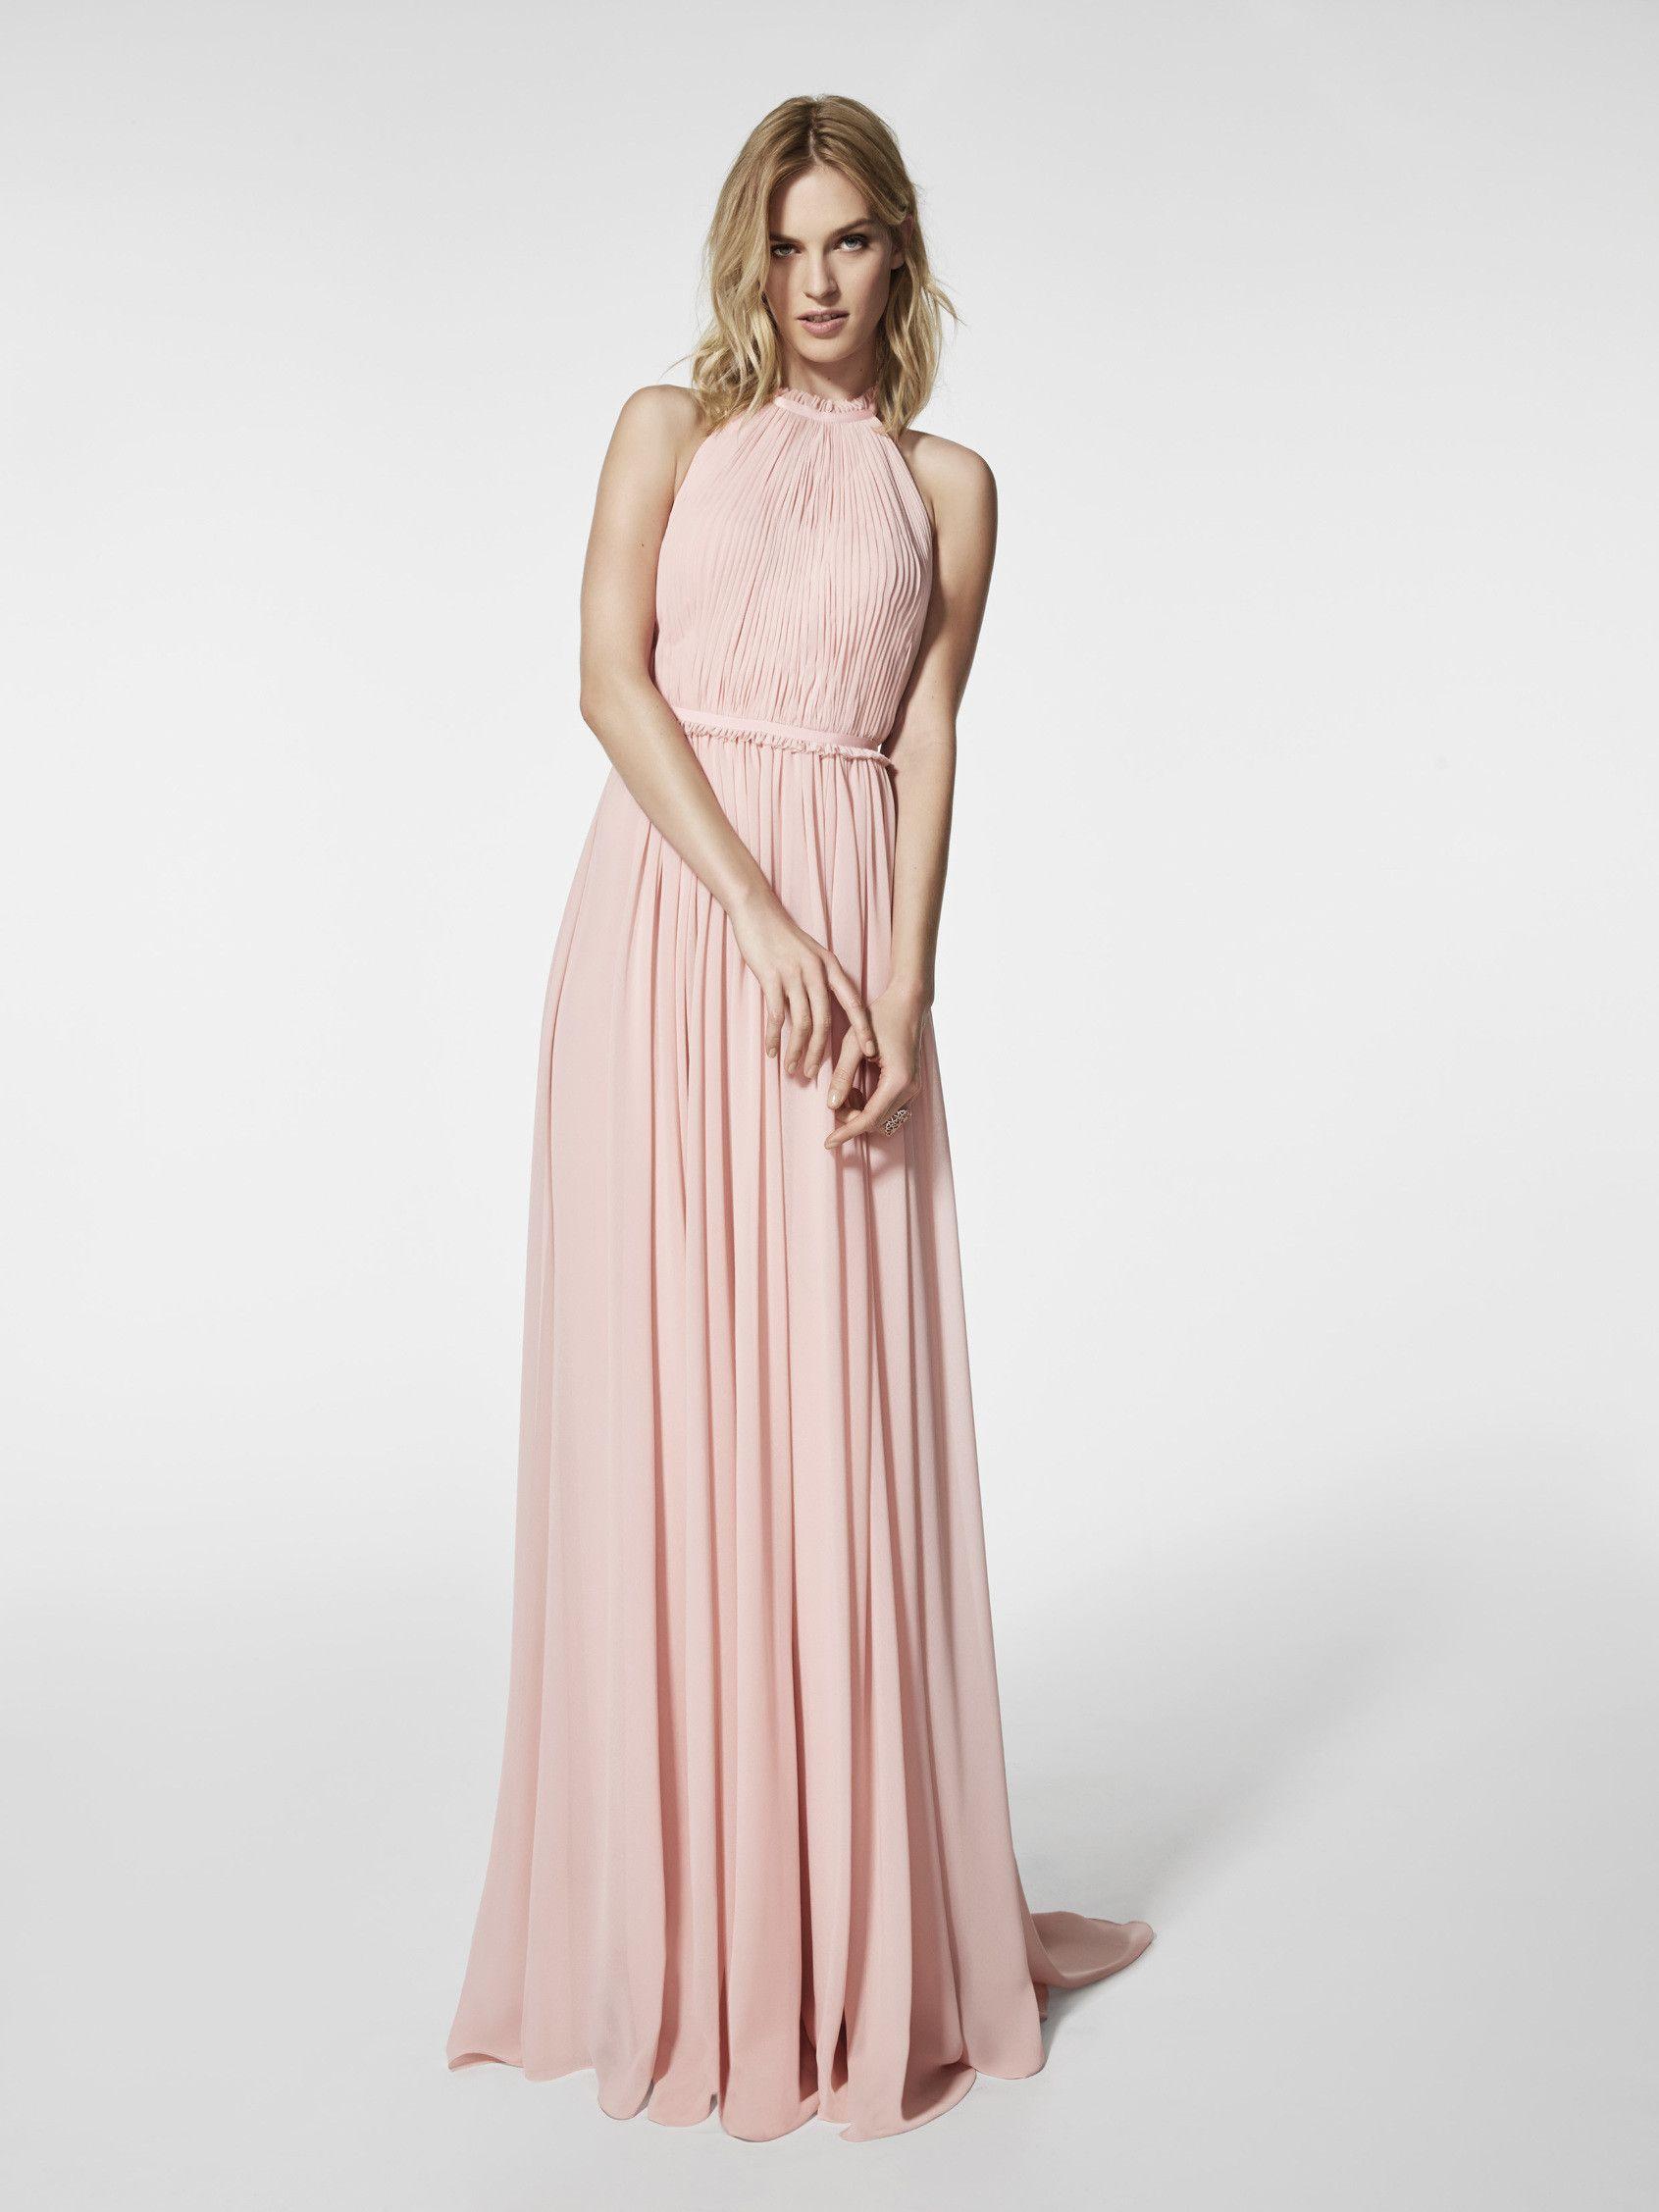 New Design Simple A Line Halter Evening Dress Pleats Top Chiffion ...